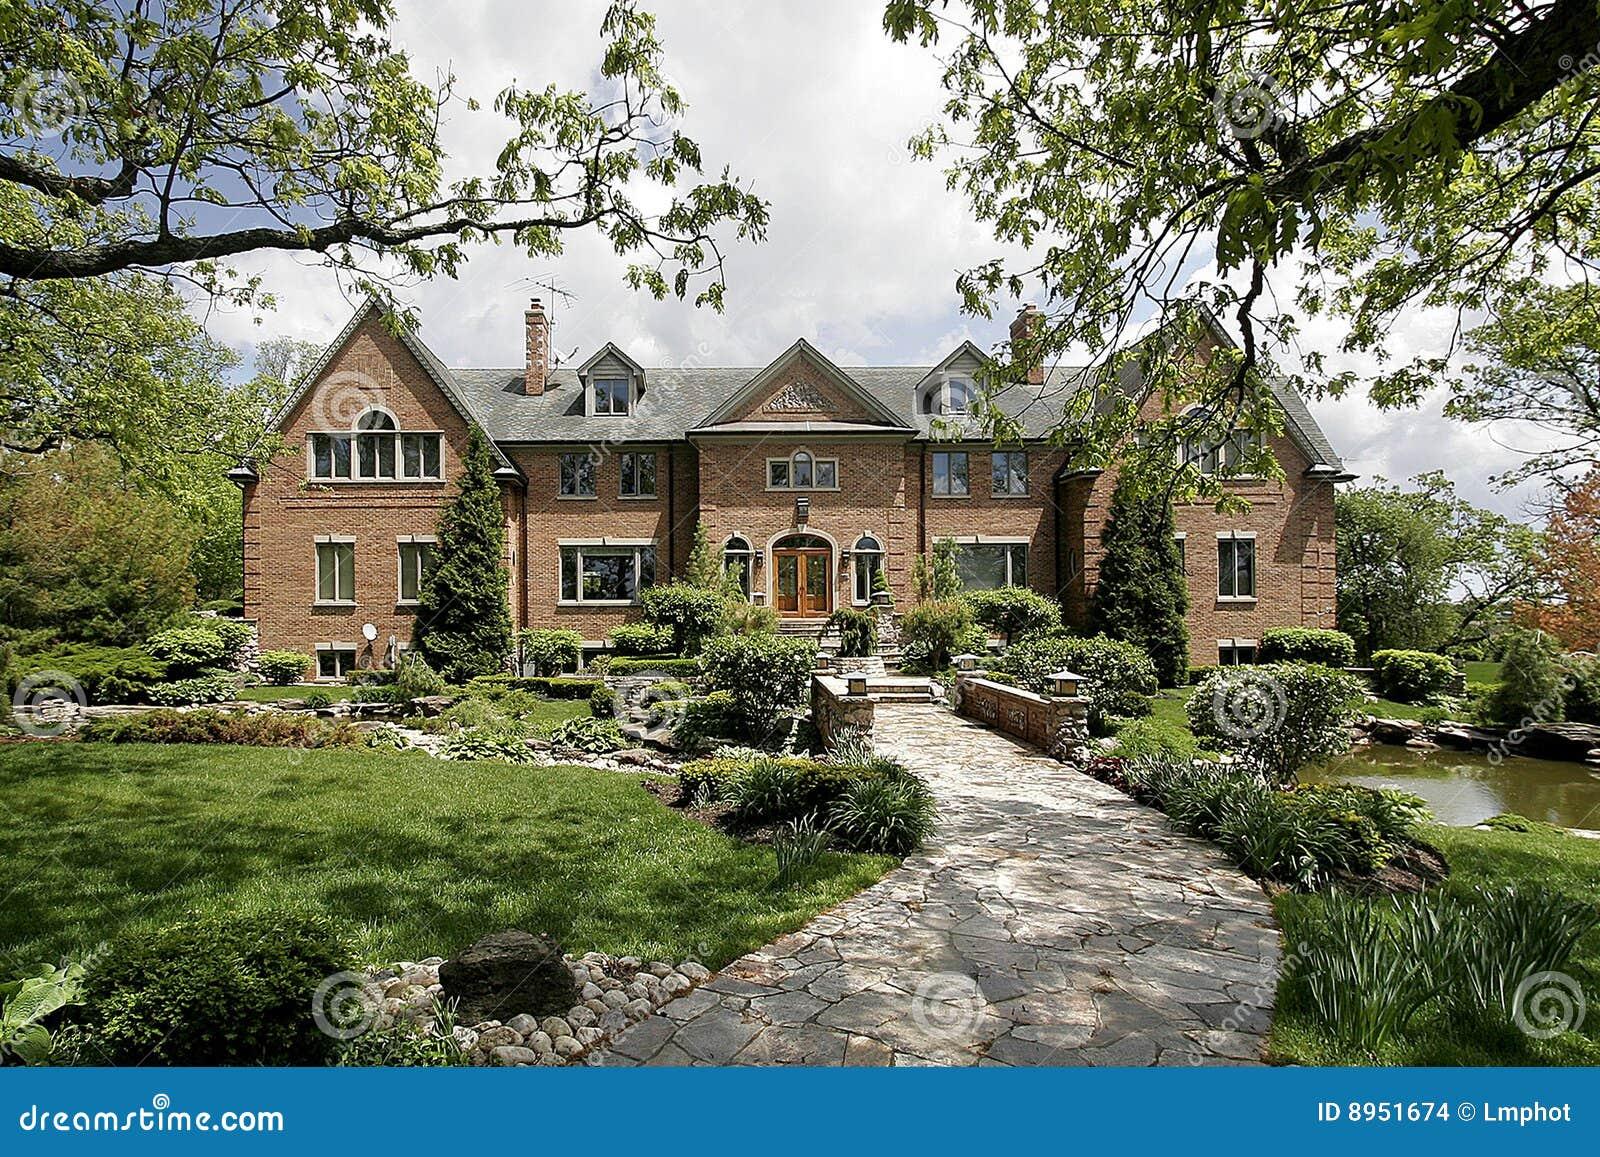 luxury-home-stone-walkway-8951674.jpg